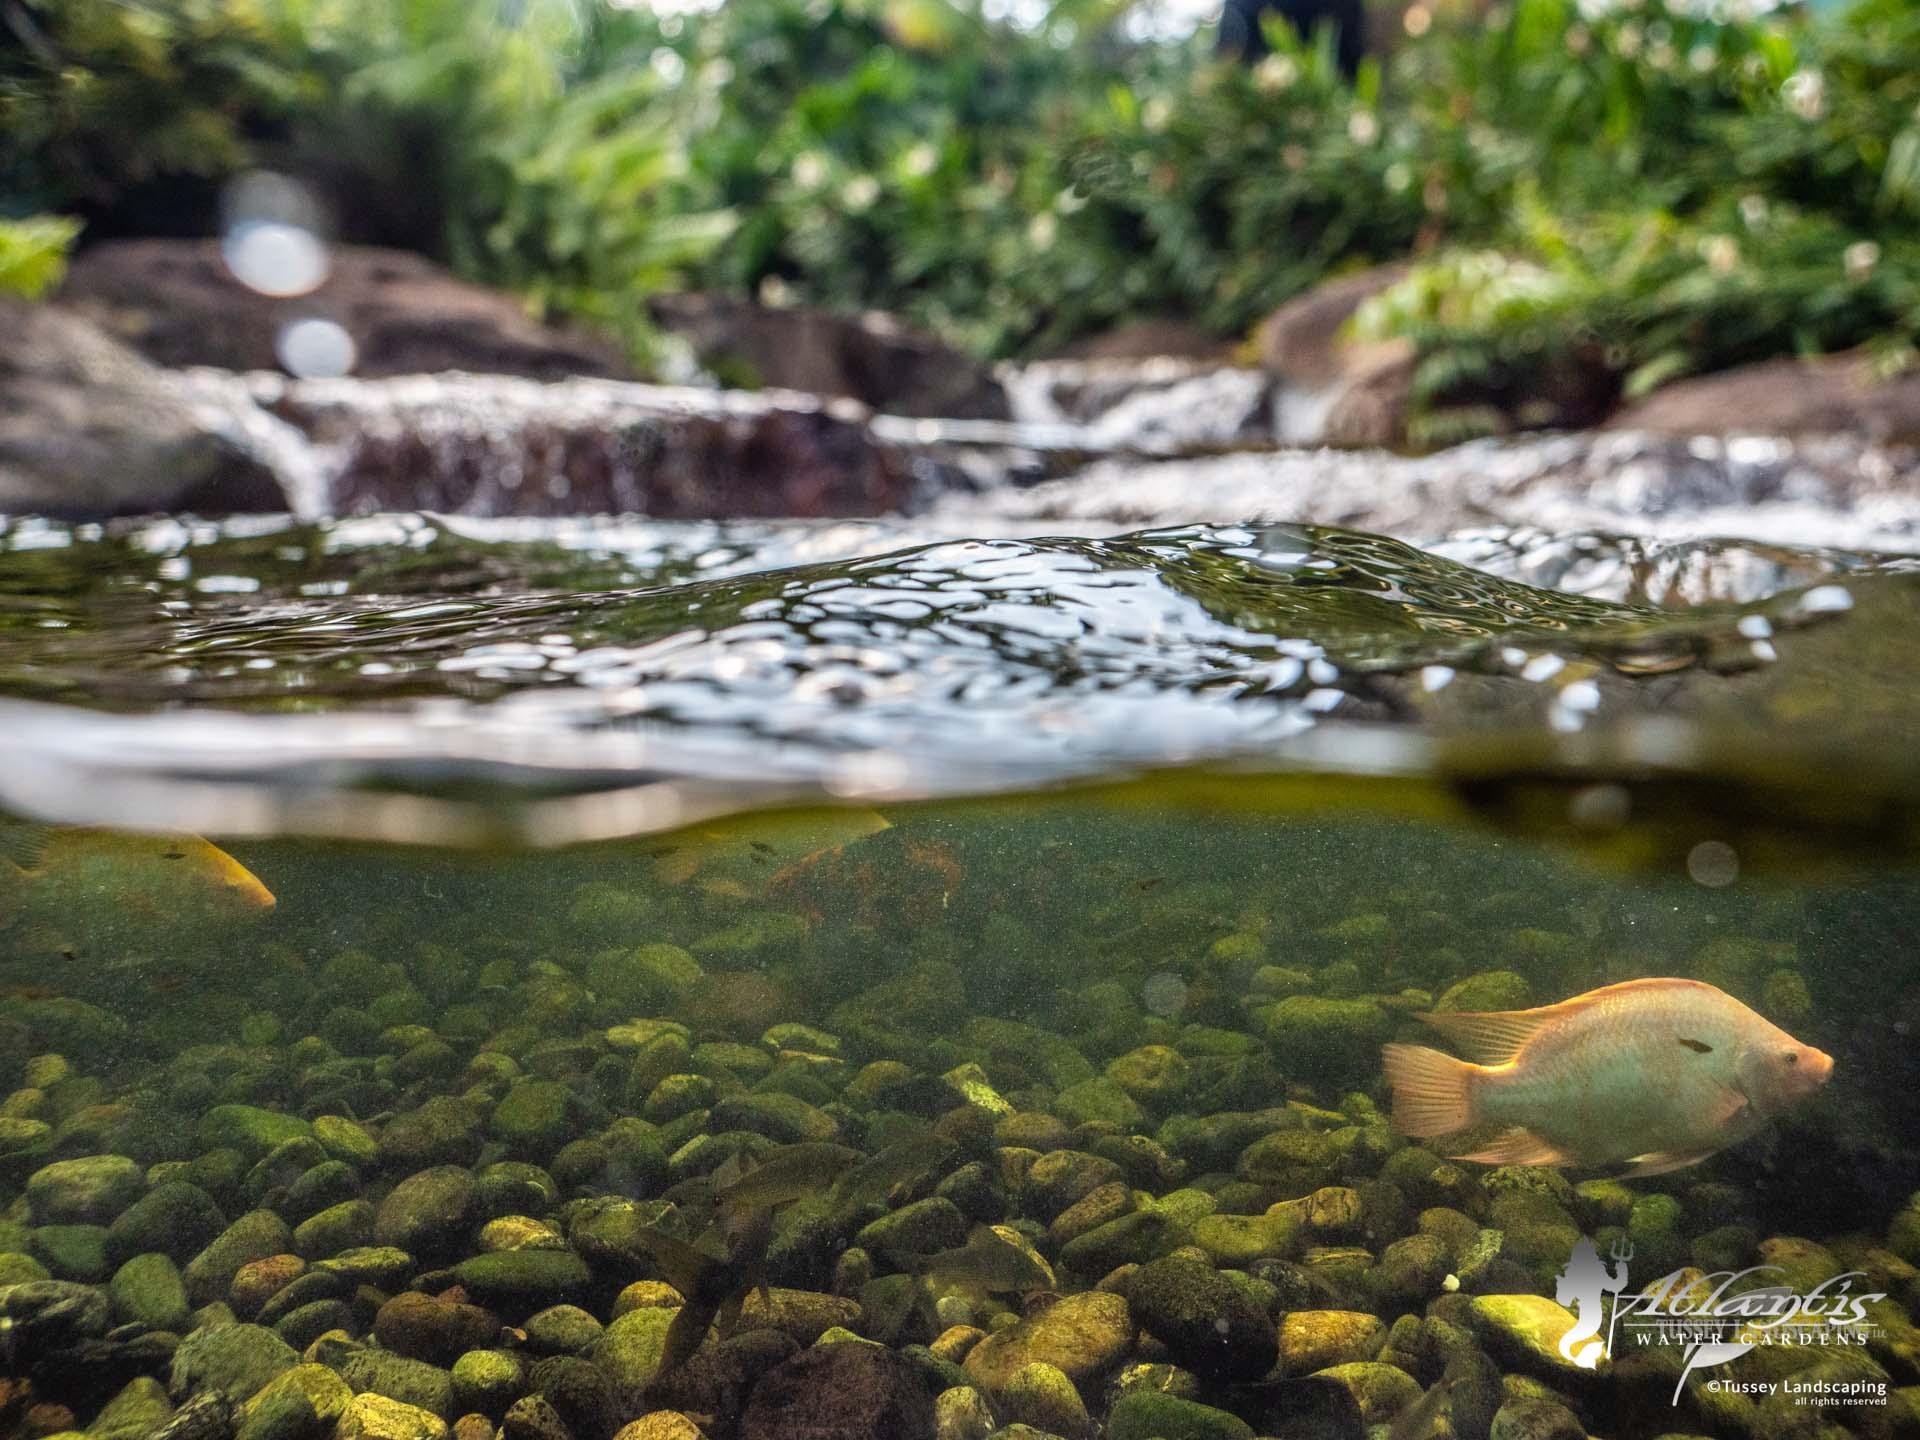 pond in villaviciencio colombia, primavera urbana